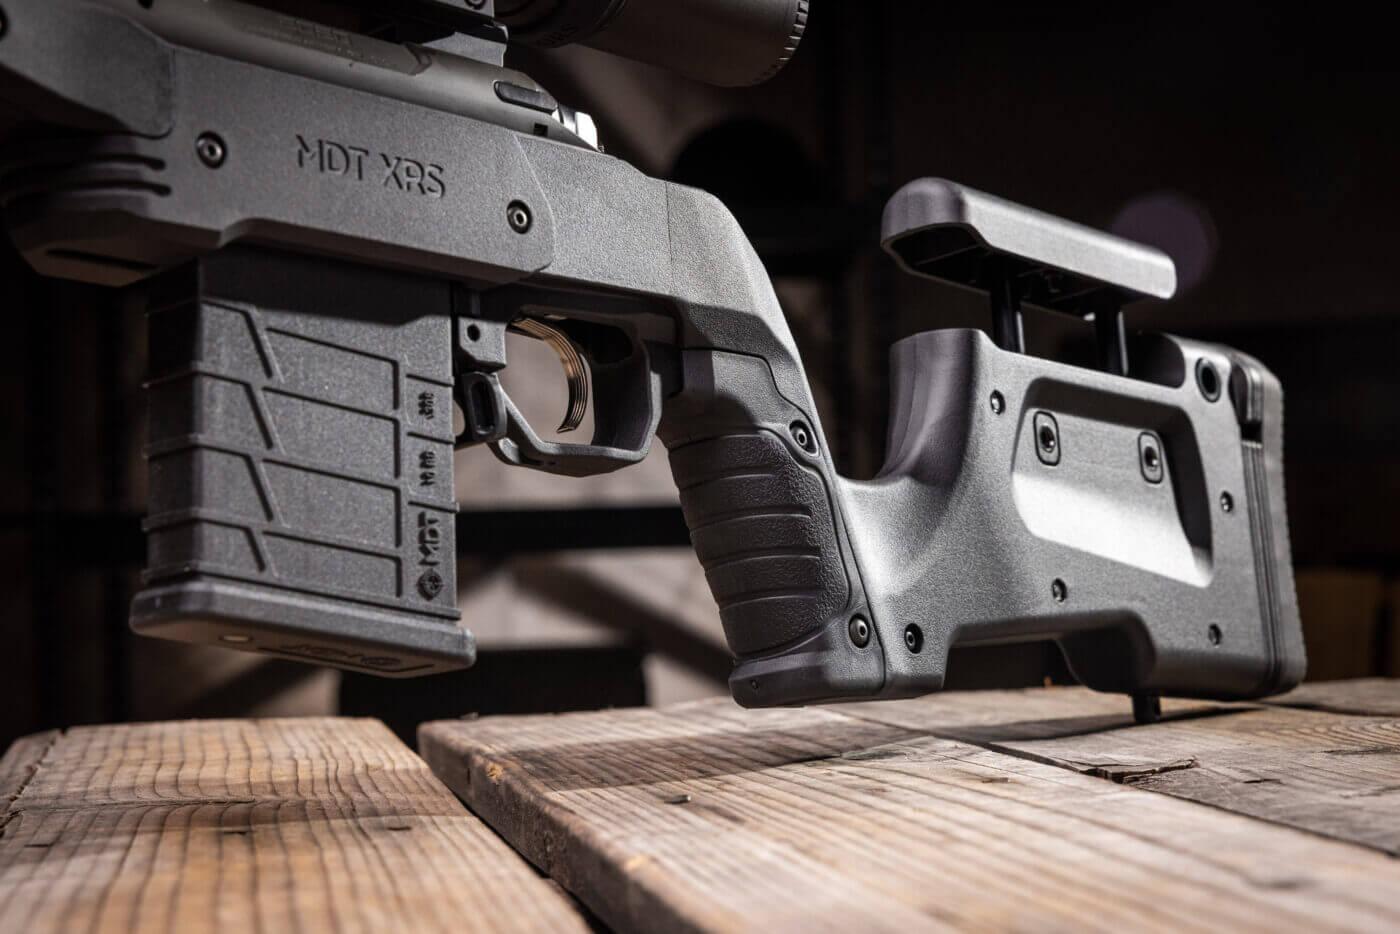 MDT rifle stock